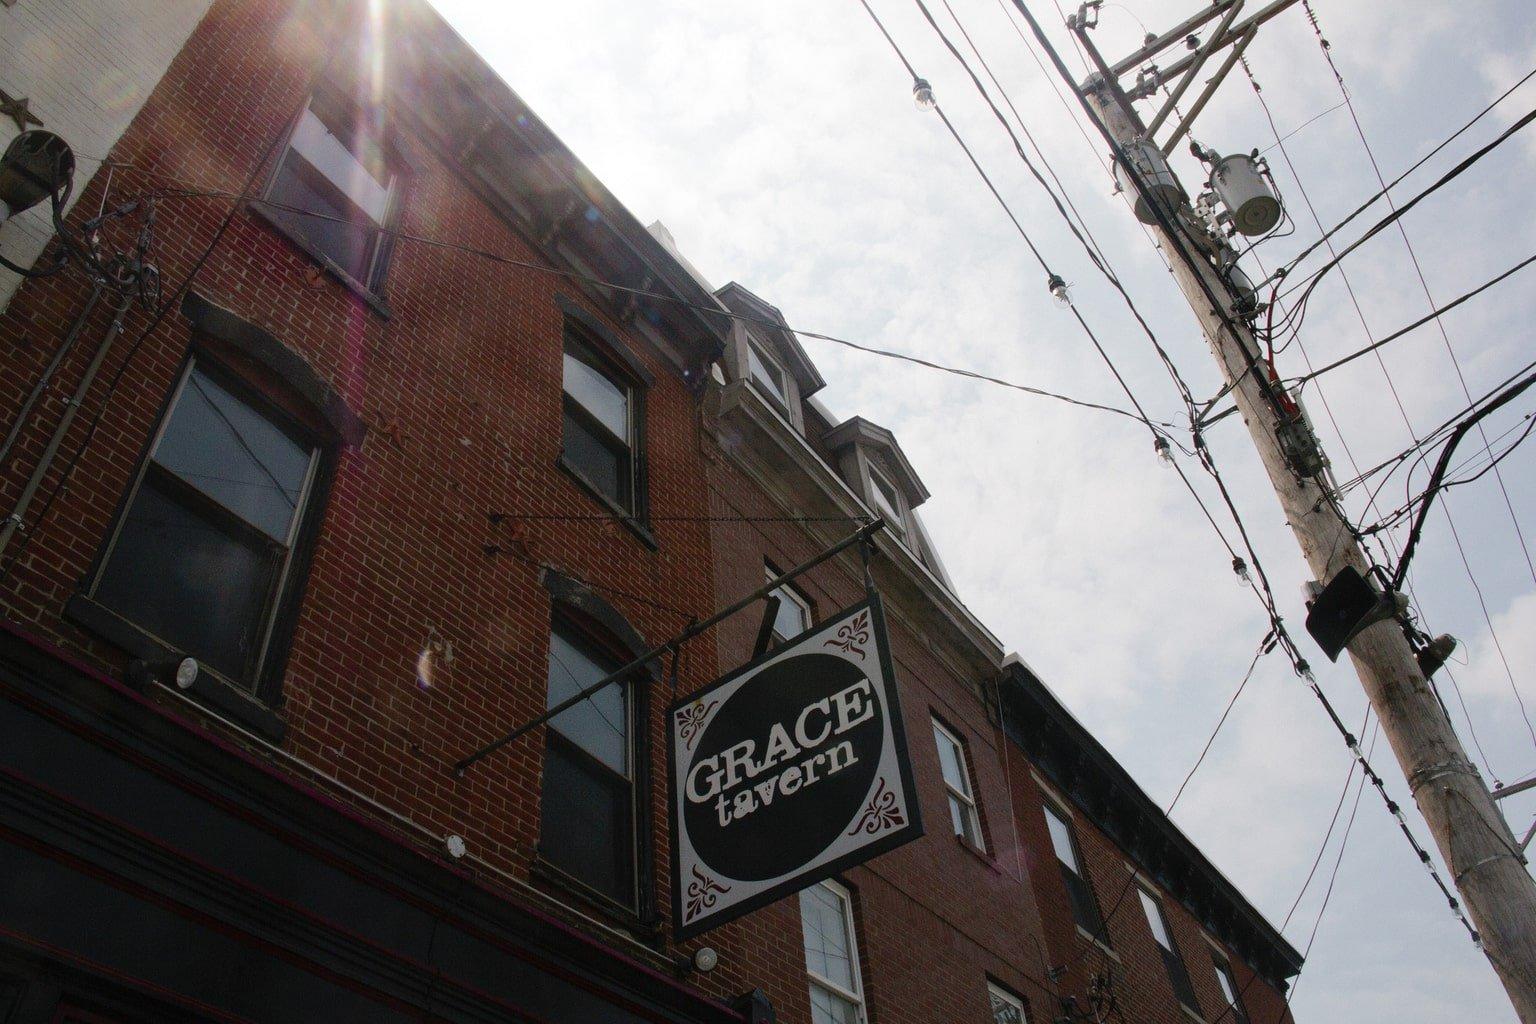 Grace's Tavern